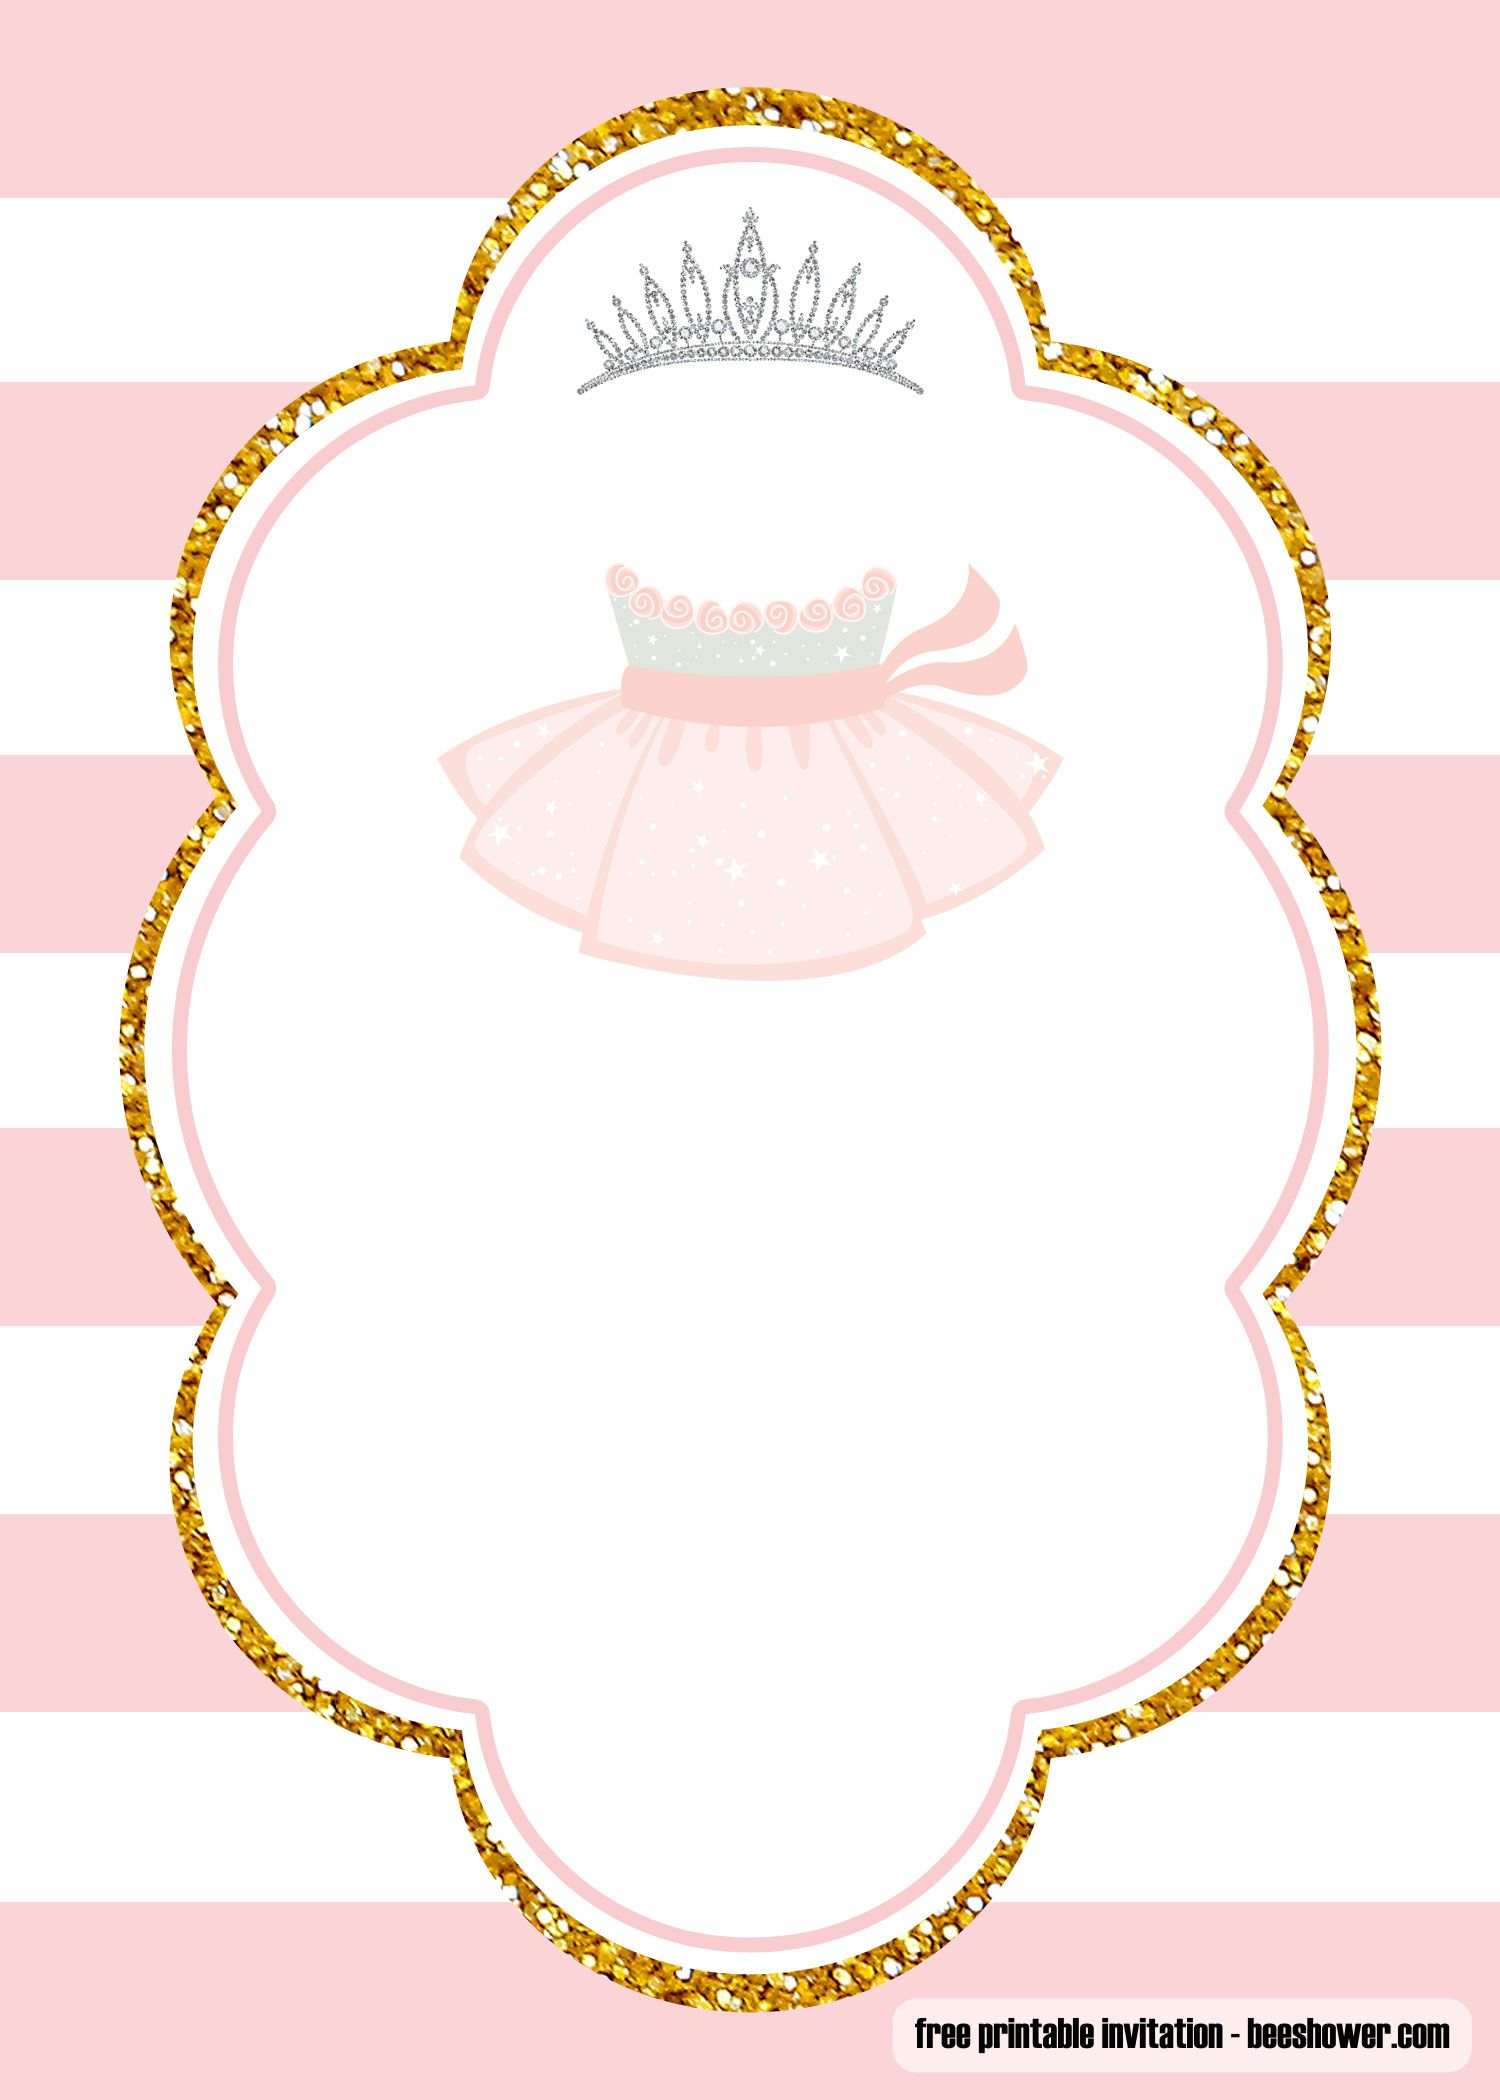 FREE Ballerina Baby Shower Invitations Templates  Ballerina baby